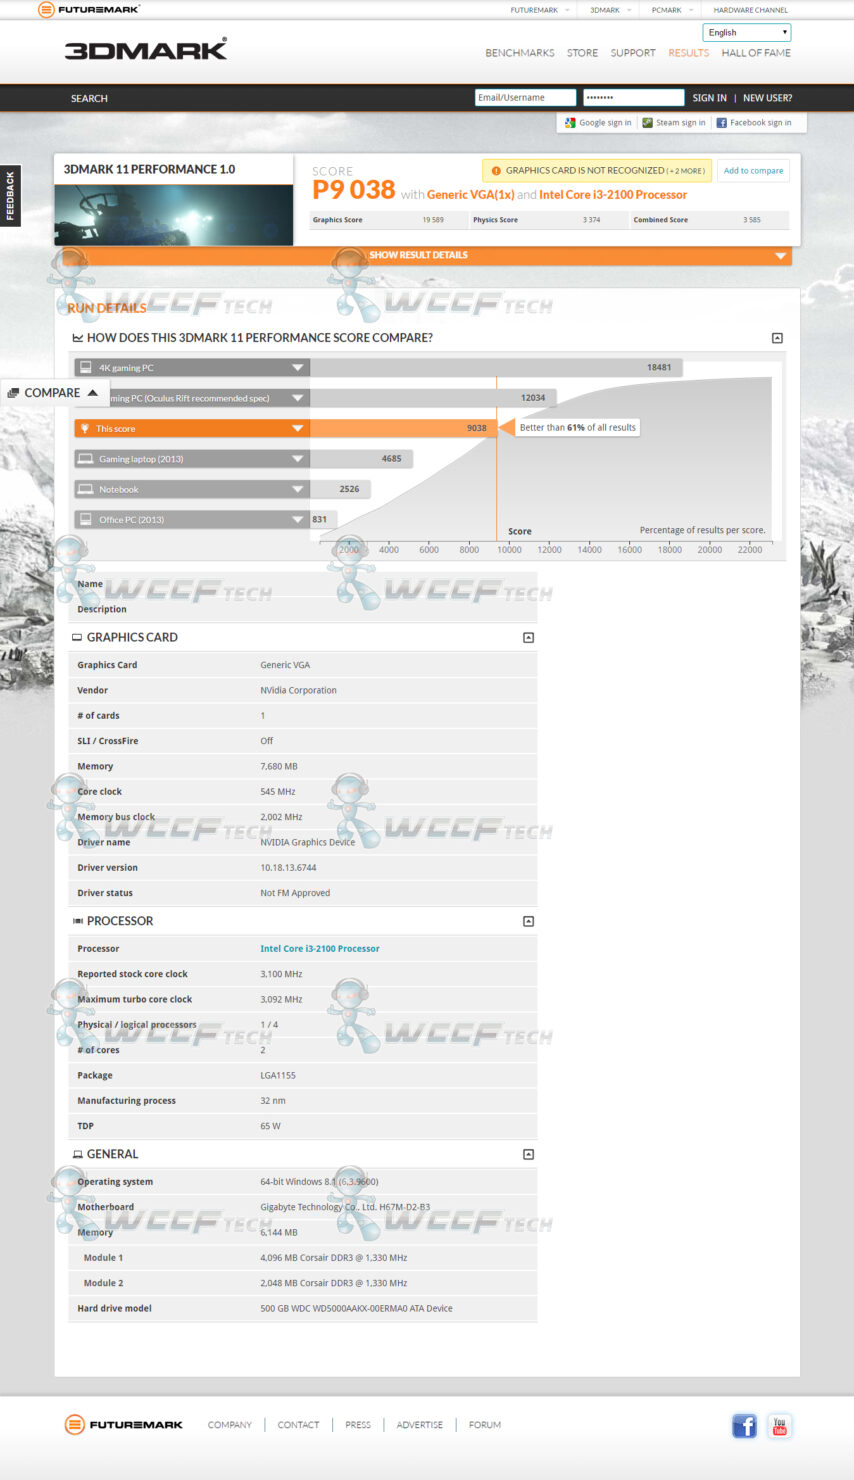 nvidia-pascal-3dmark-11-i3-2100-copy-copy